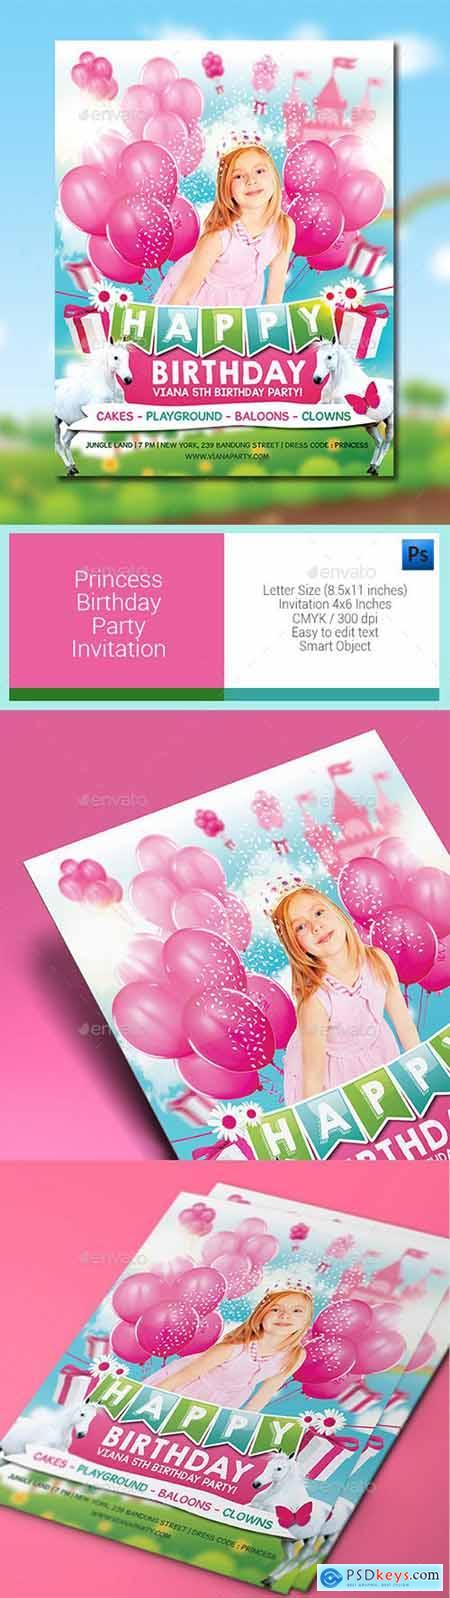 Princess Birthday Party Invitation 11752005